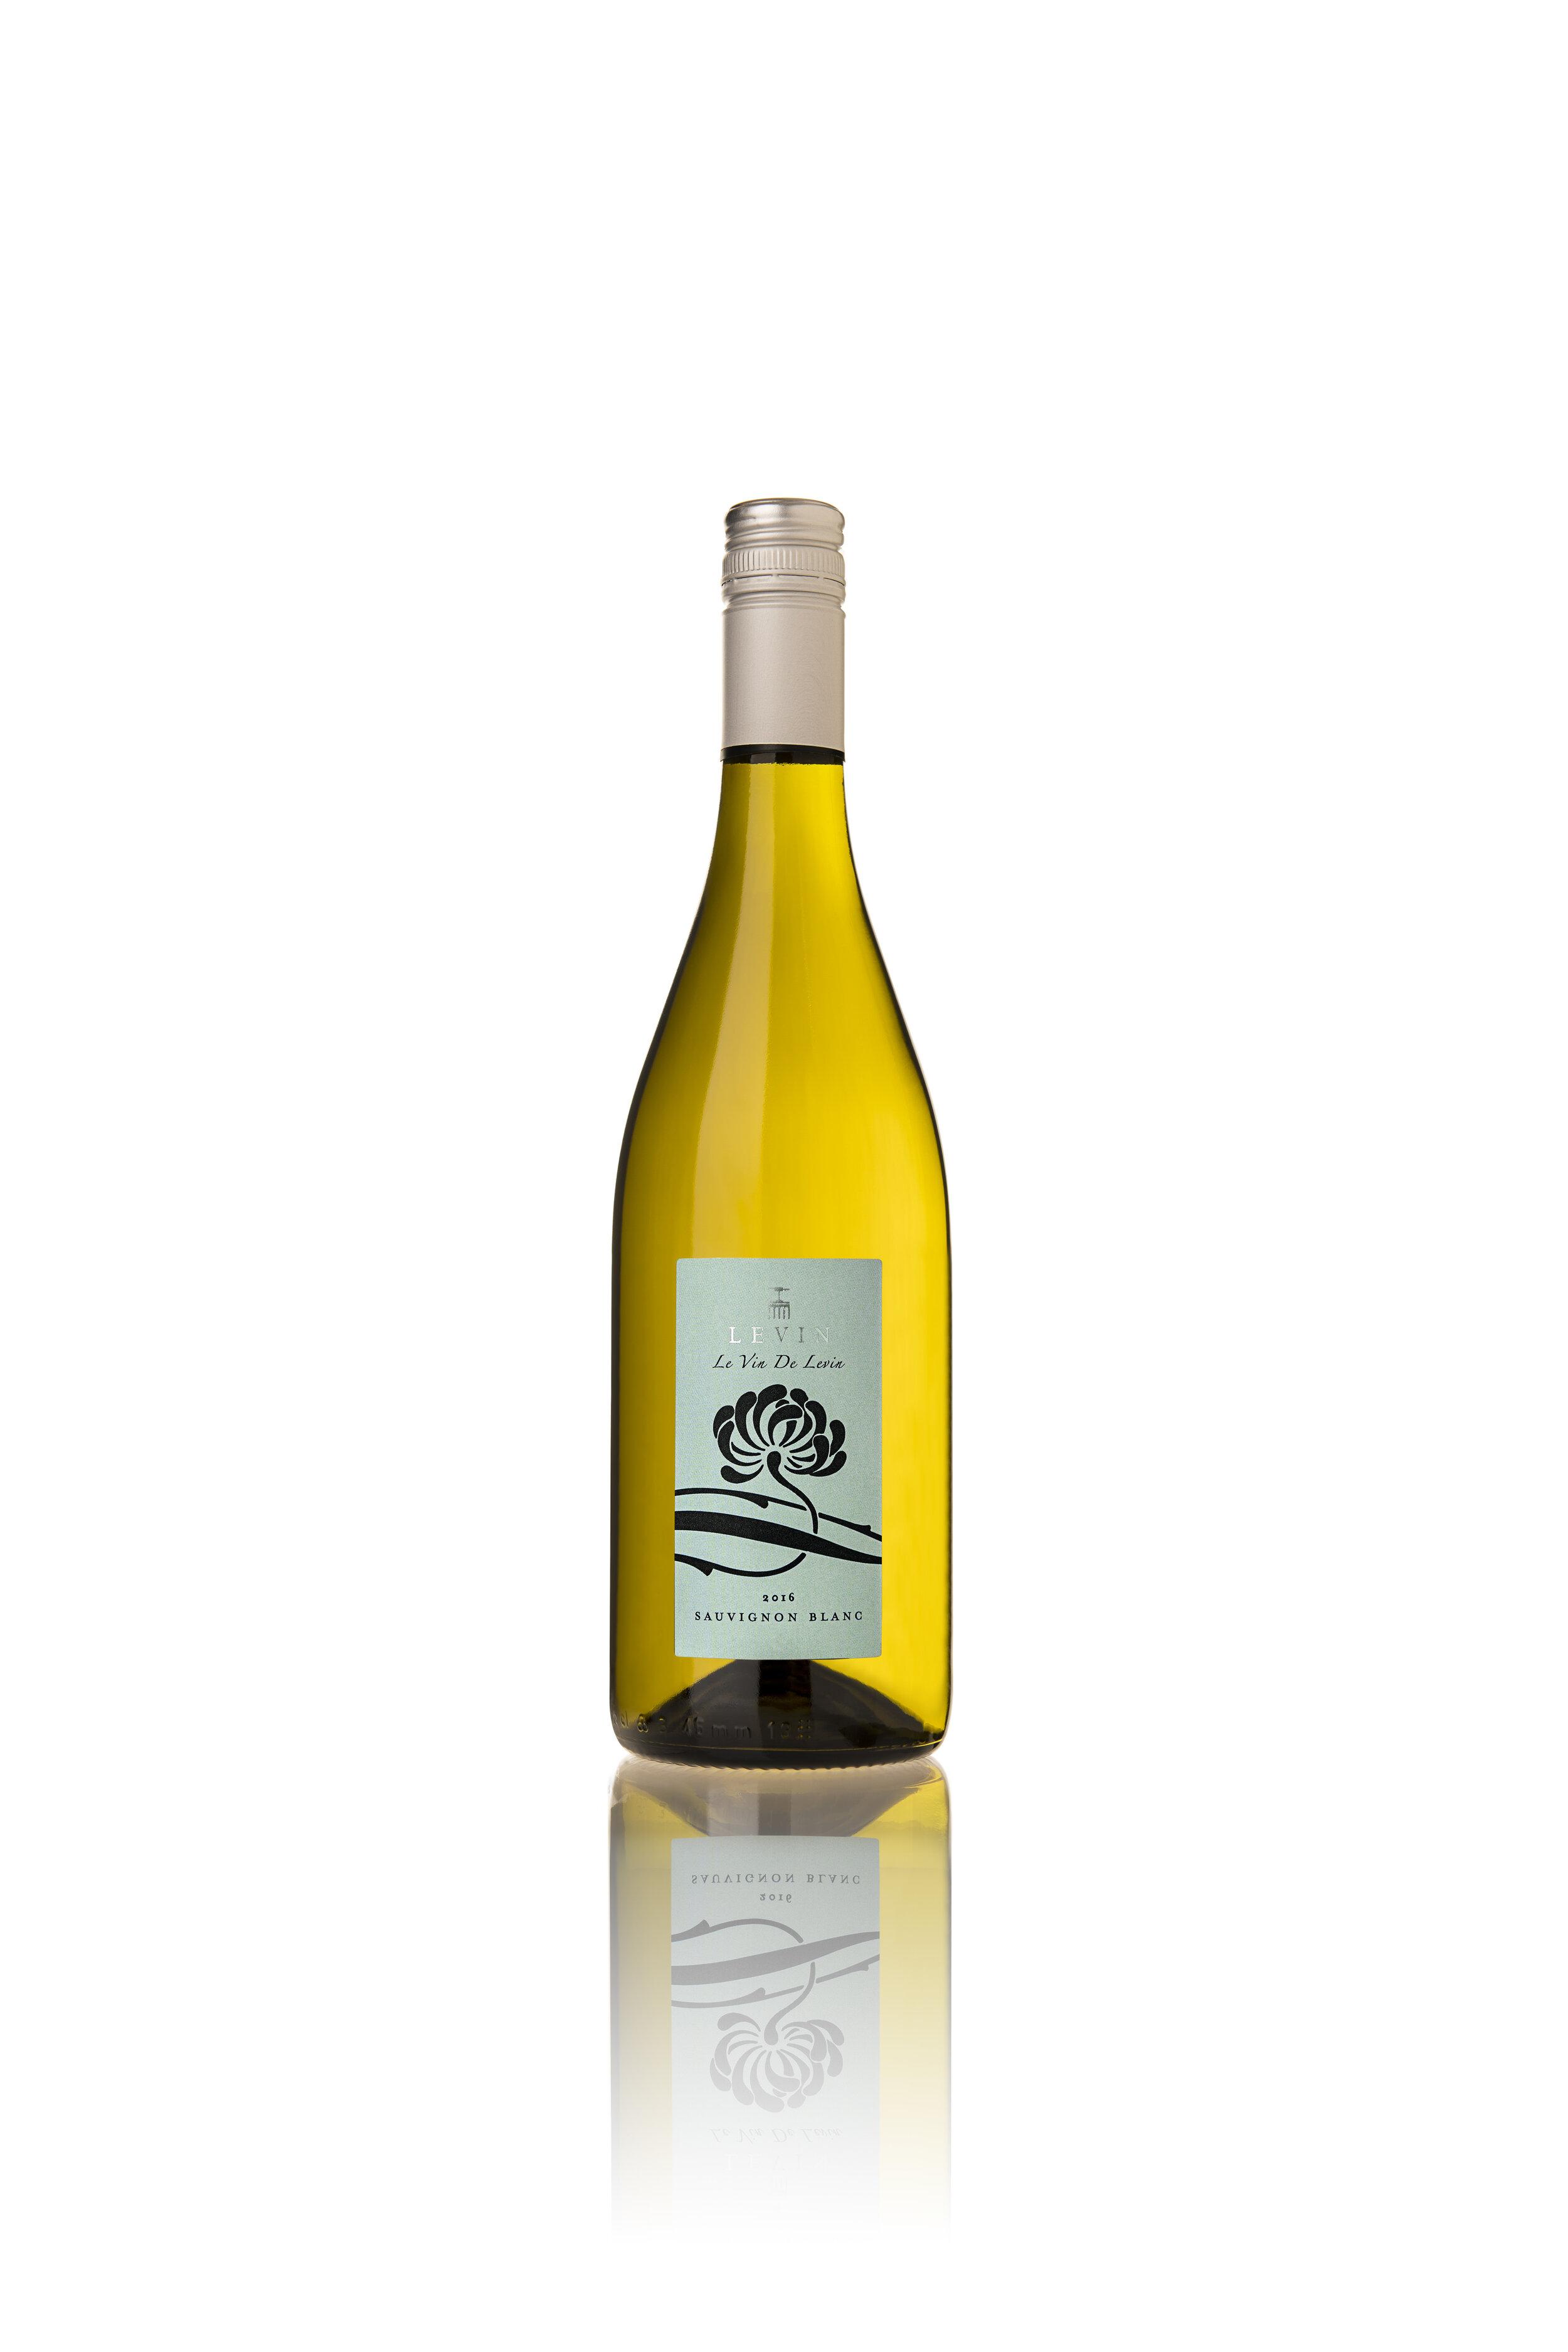 Le Vin de Levin Sauvignon Blanc